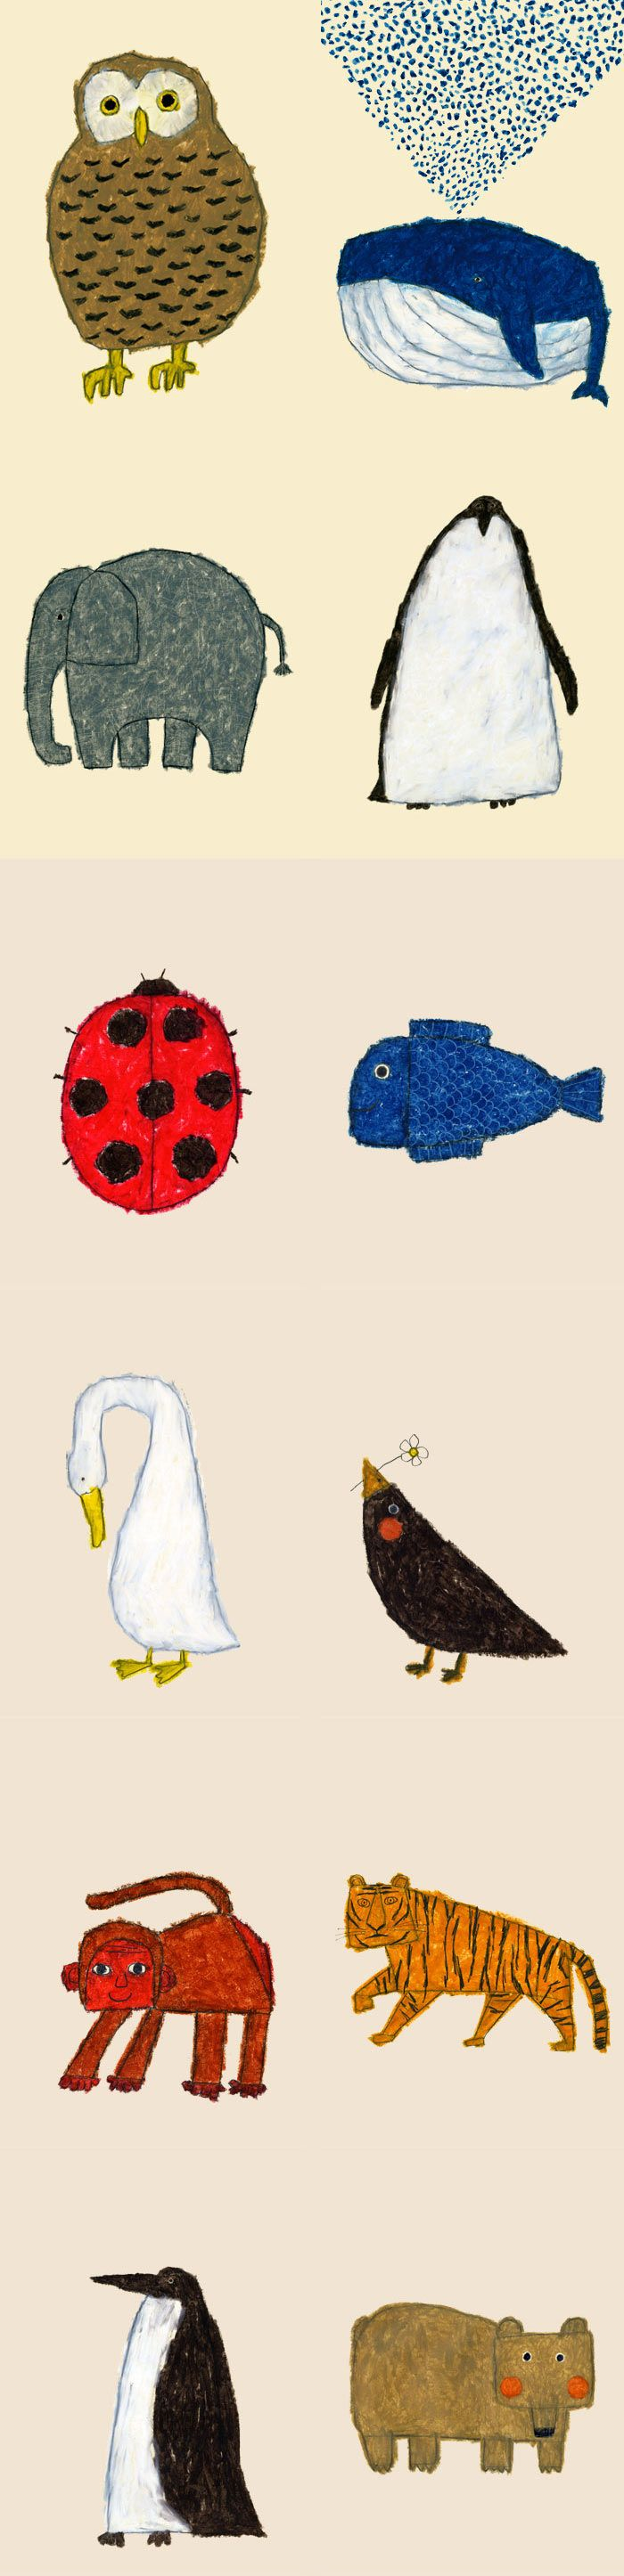 Animal figures by Yusuke Yonezu